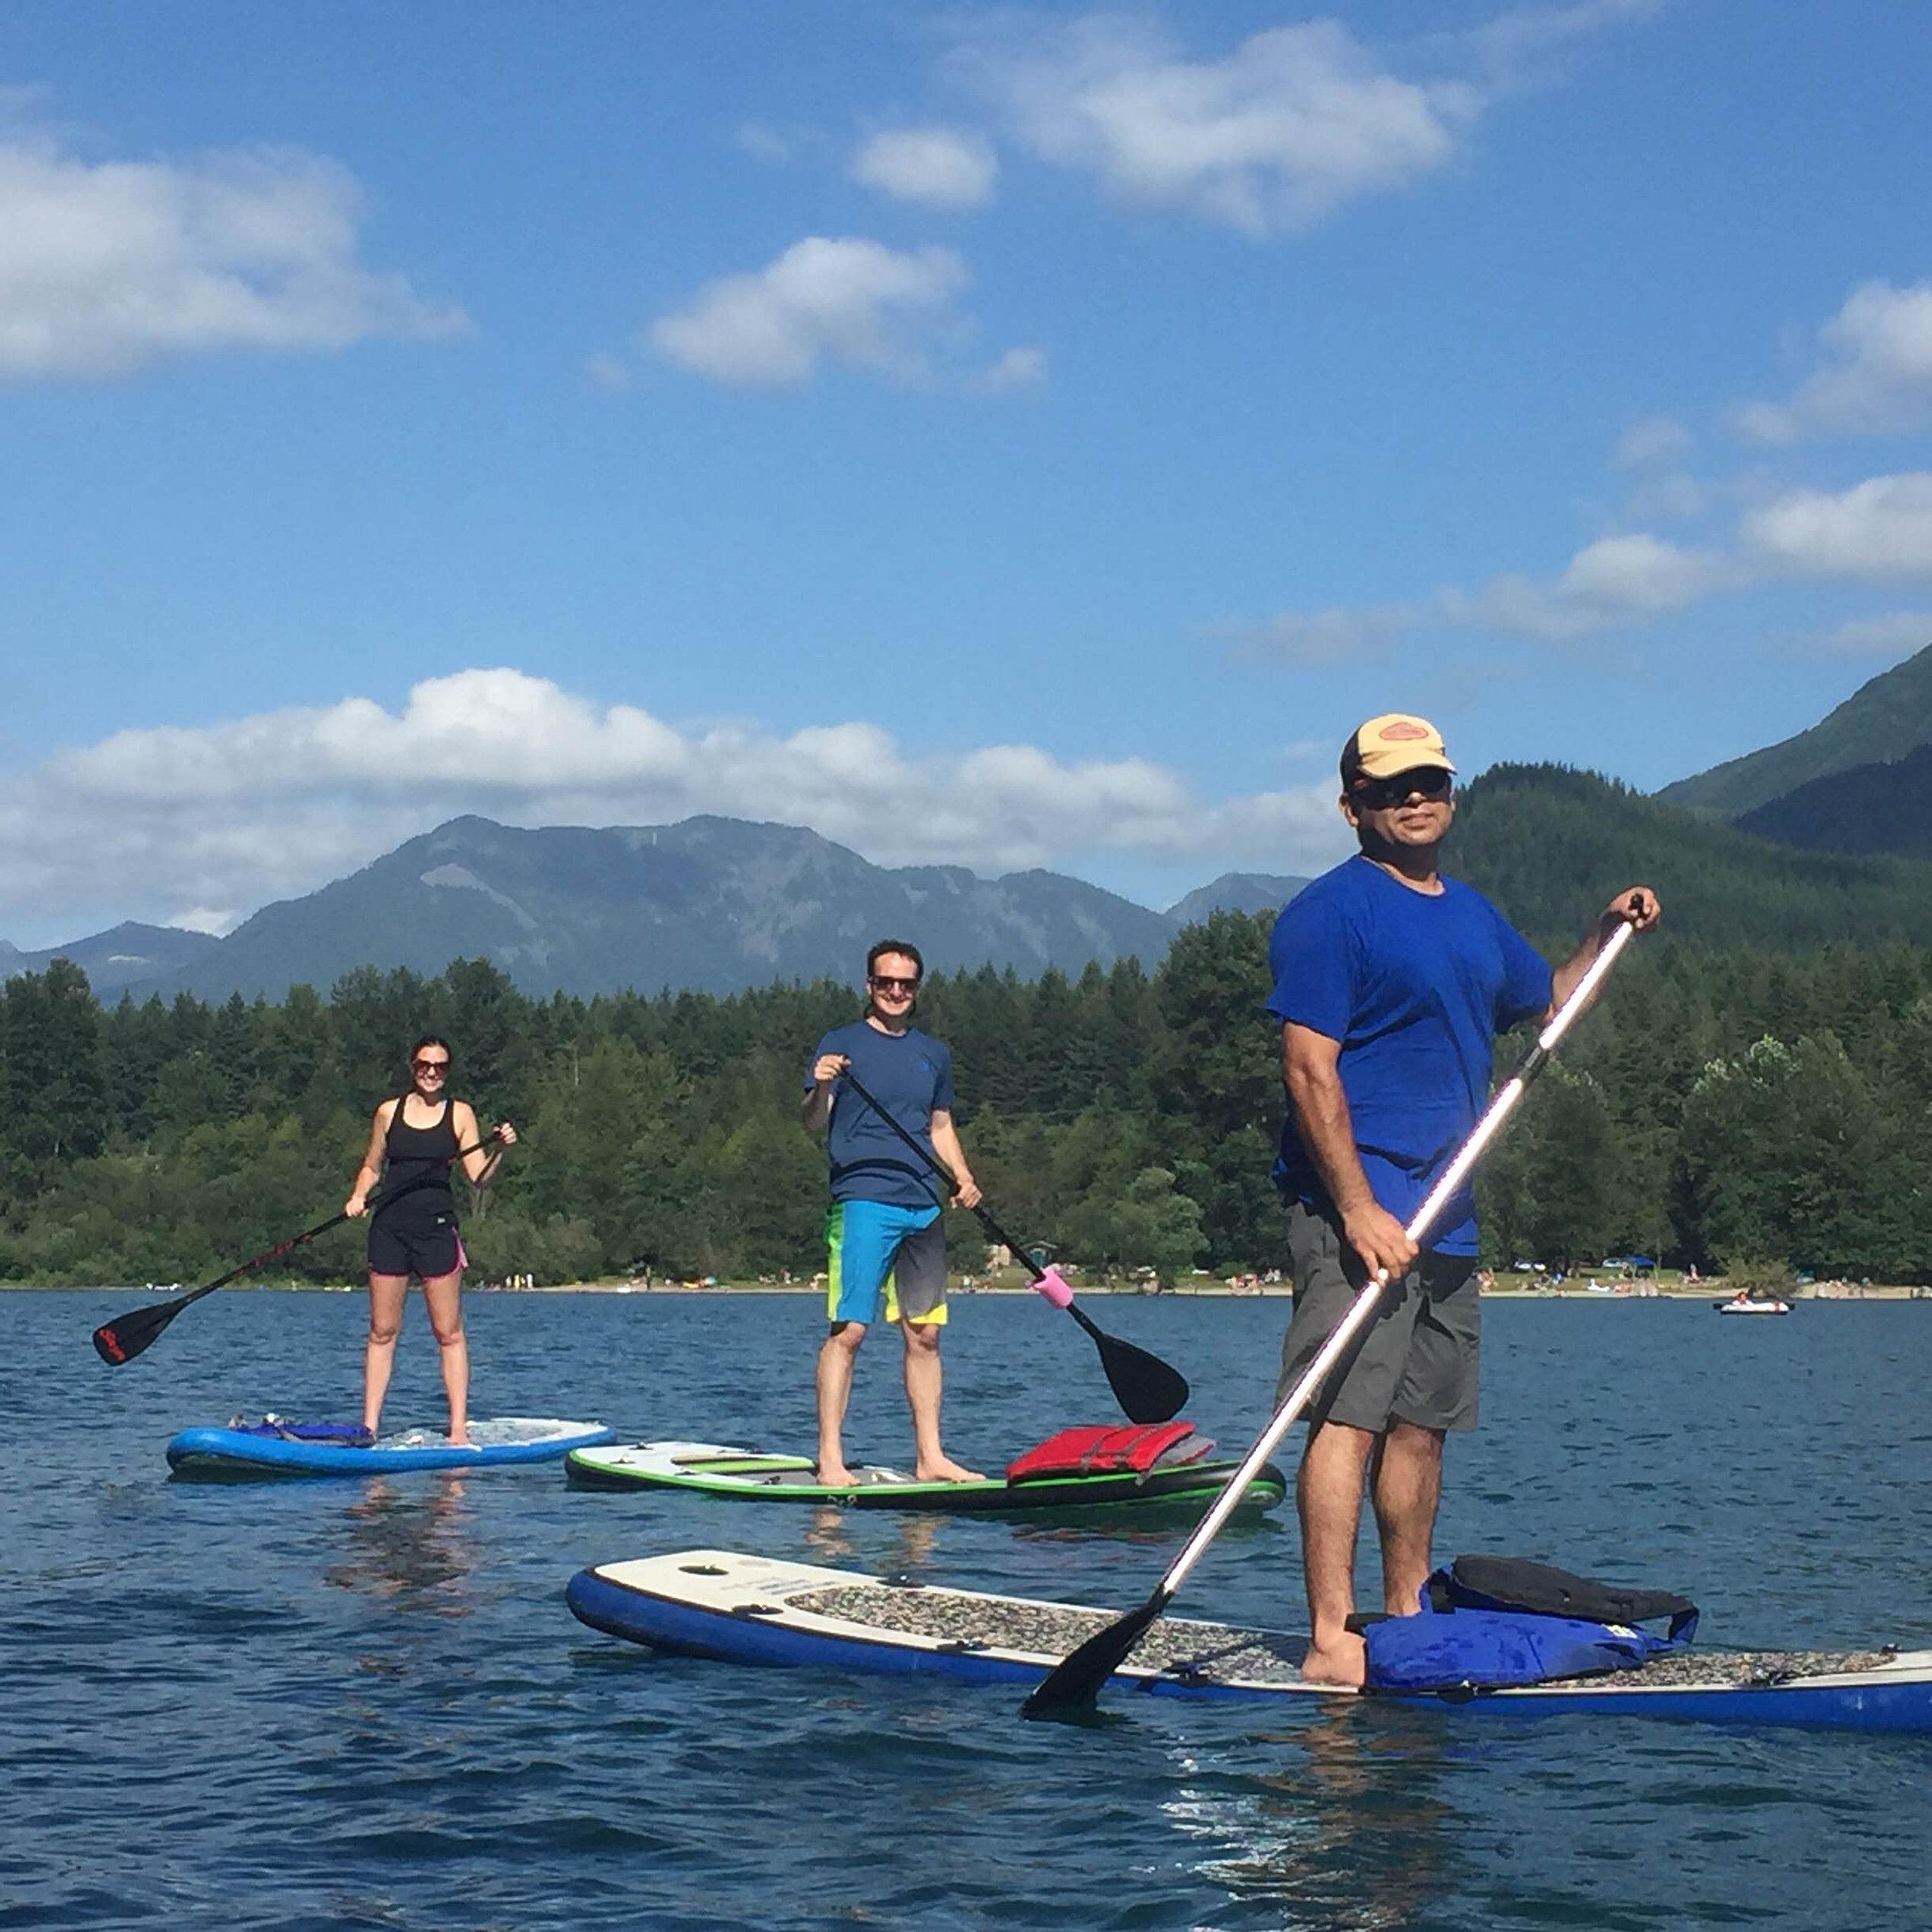 Image result for dave scadden paddle board image